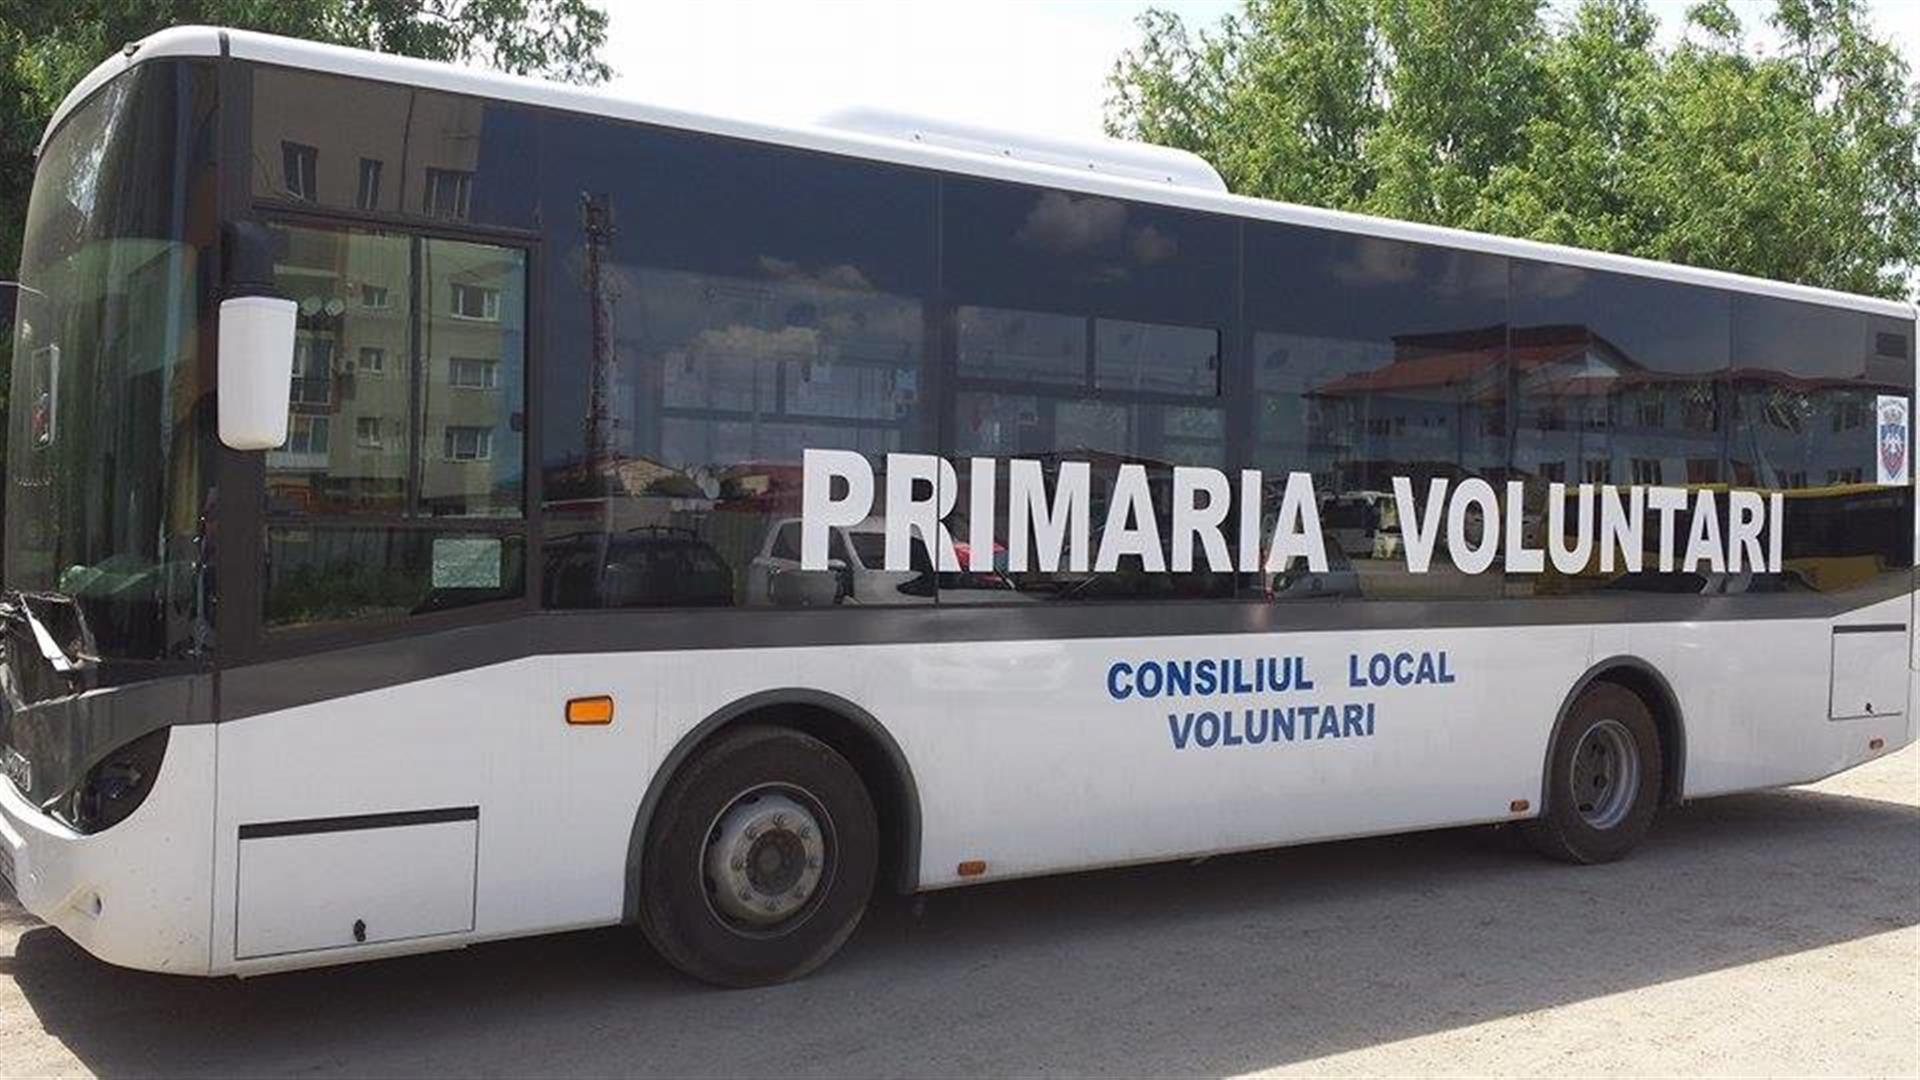 Isuzu - Inchiriere autobuze - Serviciul Transport Voluntari